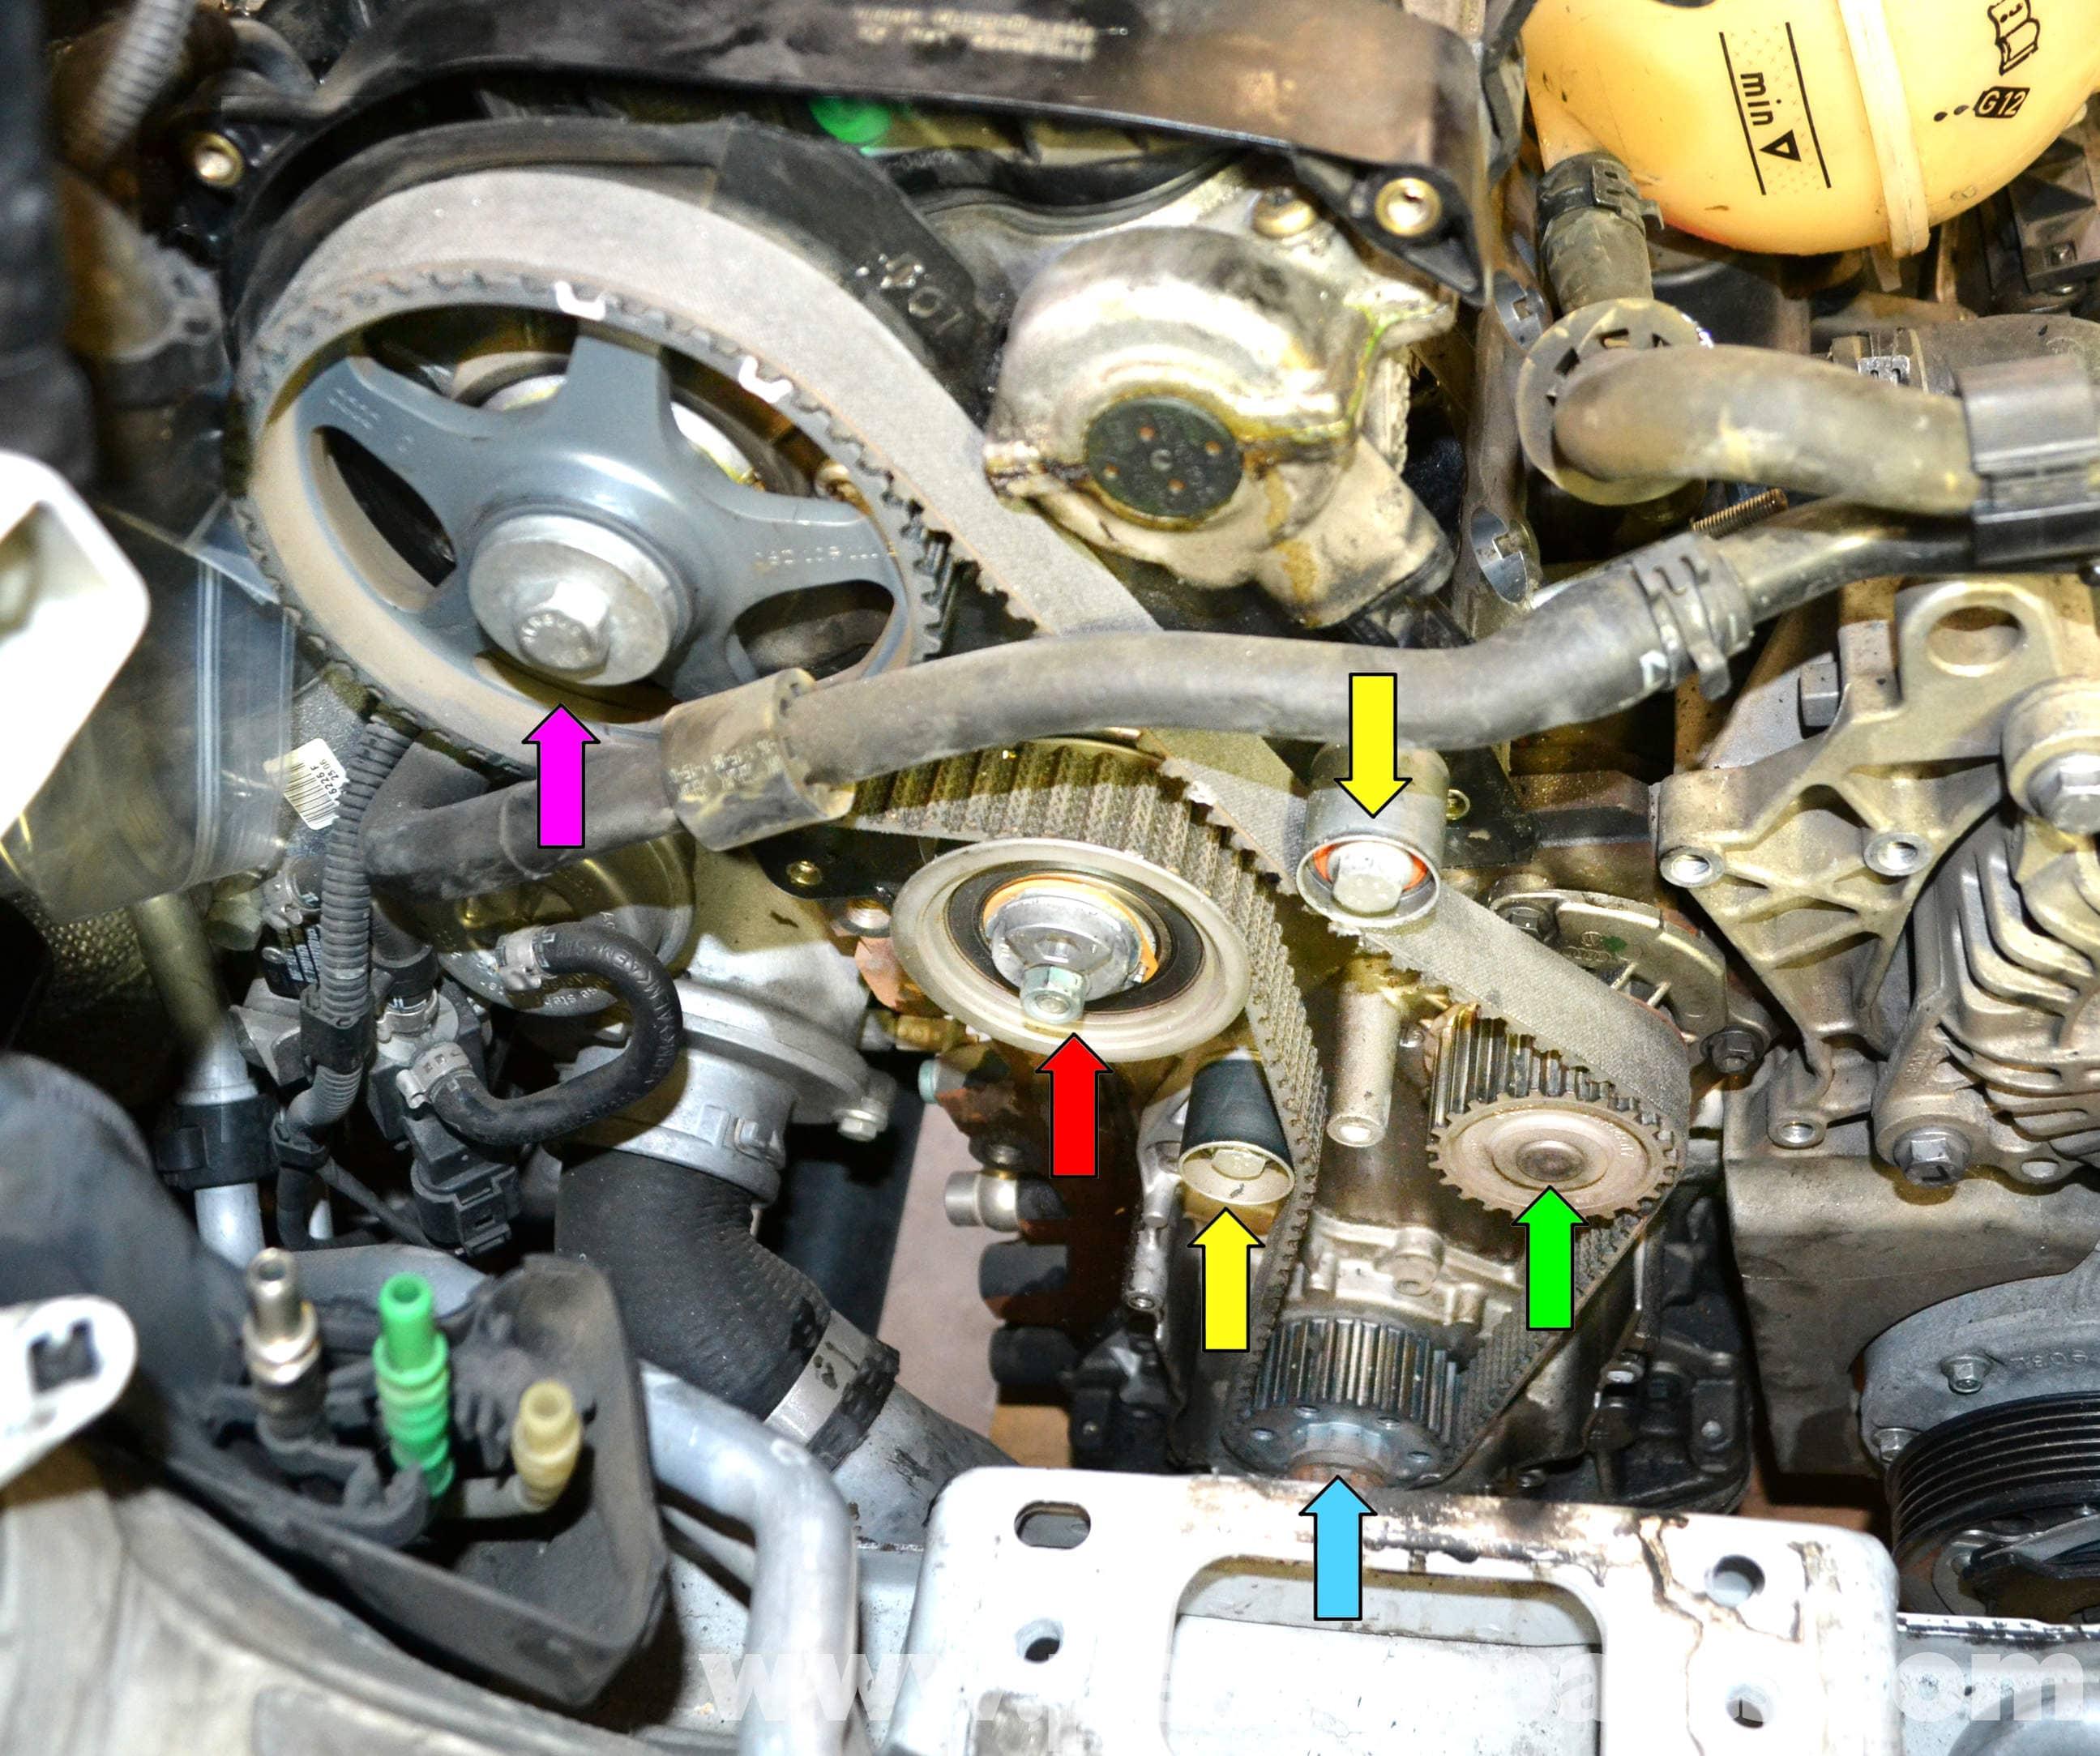 Vw Motor City Colorado Springs: Volkswagen Golf GTI Mk V Timing Belt Tensioner Replacement